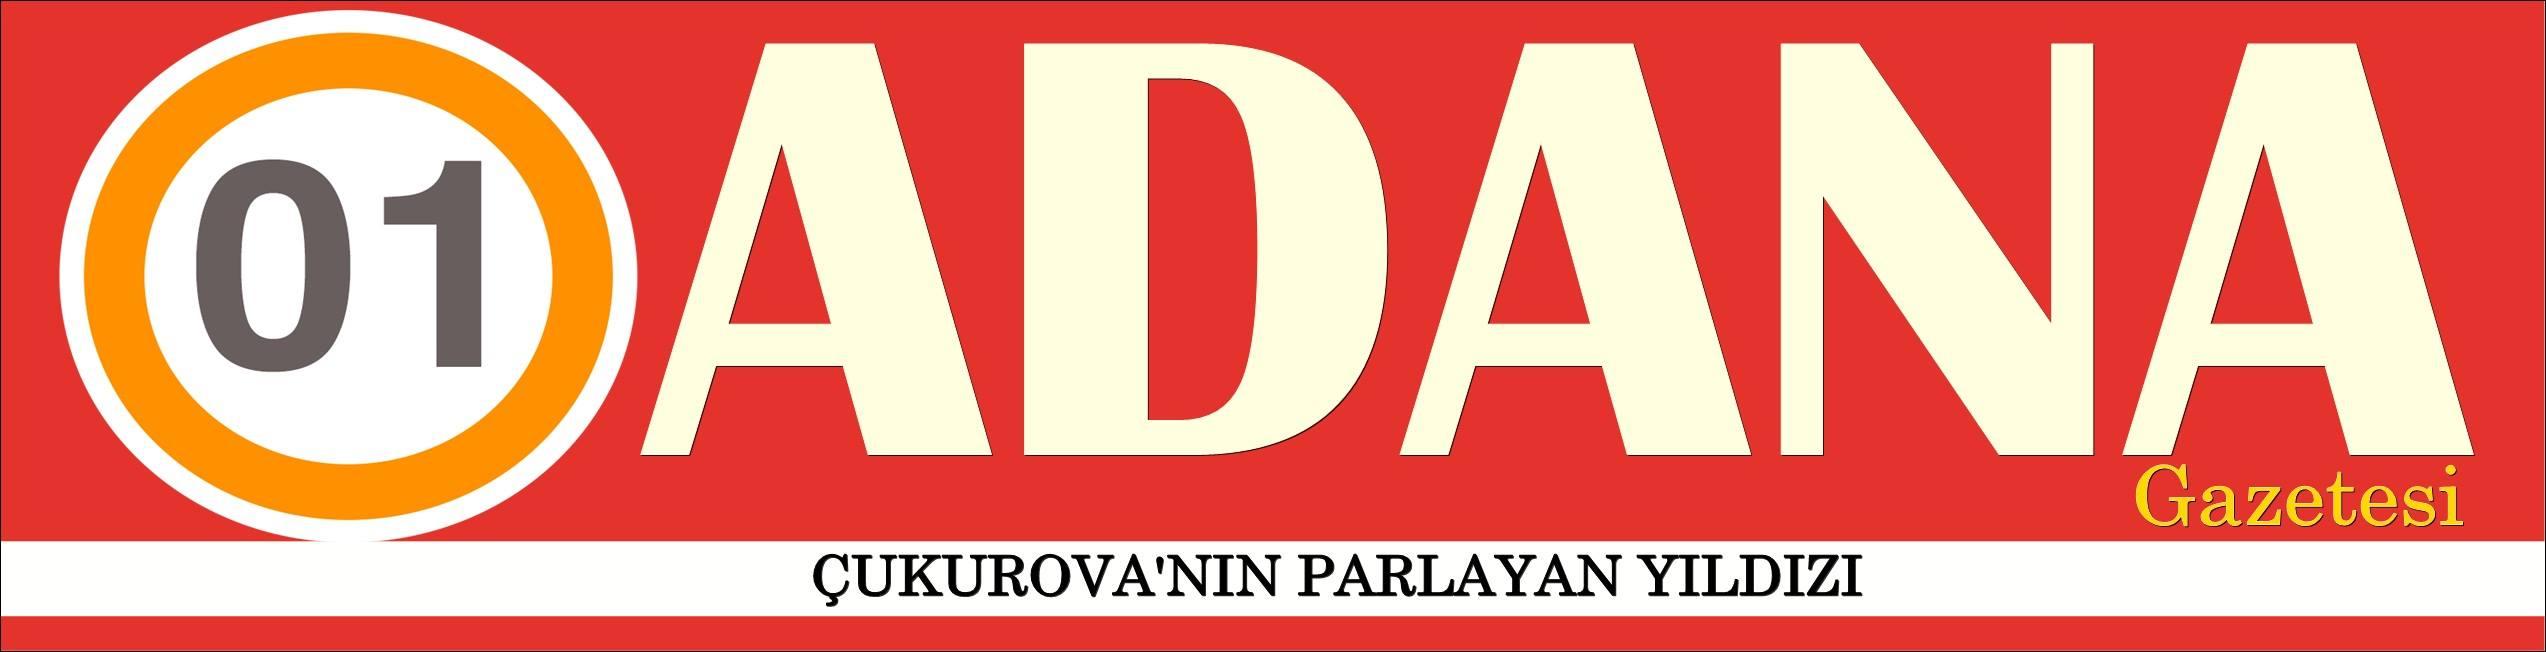 01 Adana Gazetesi